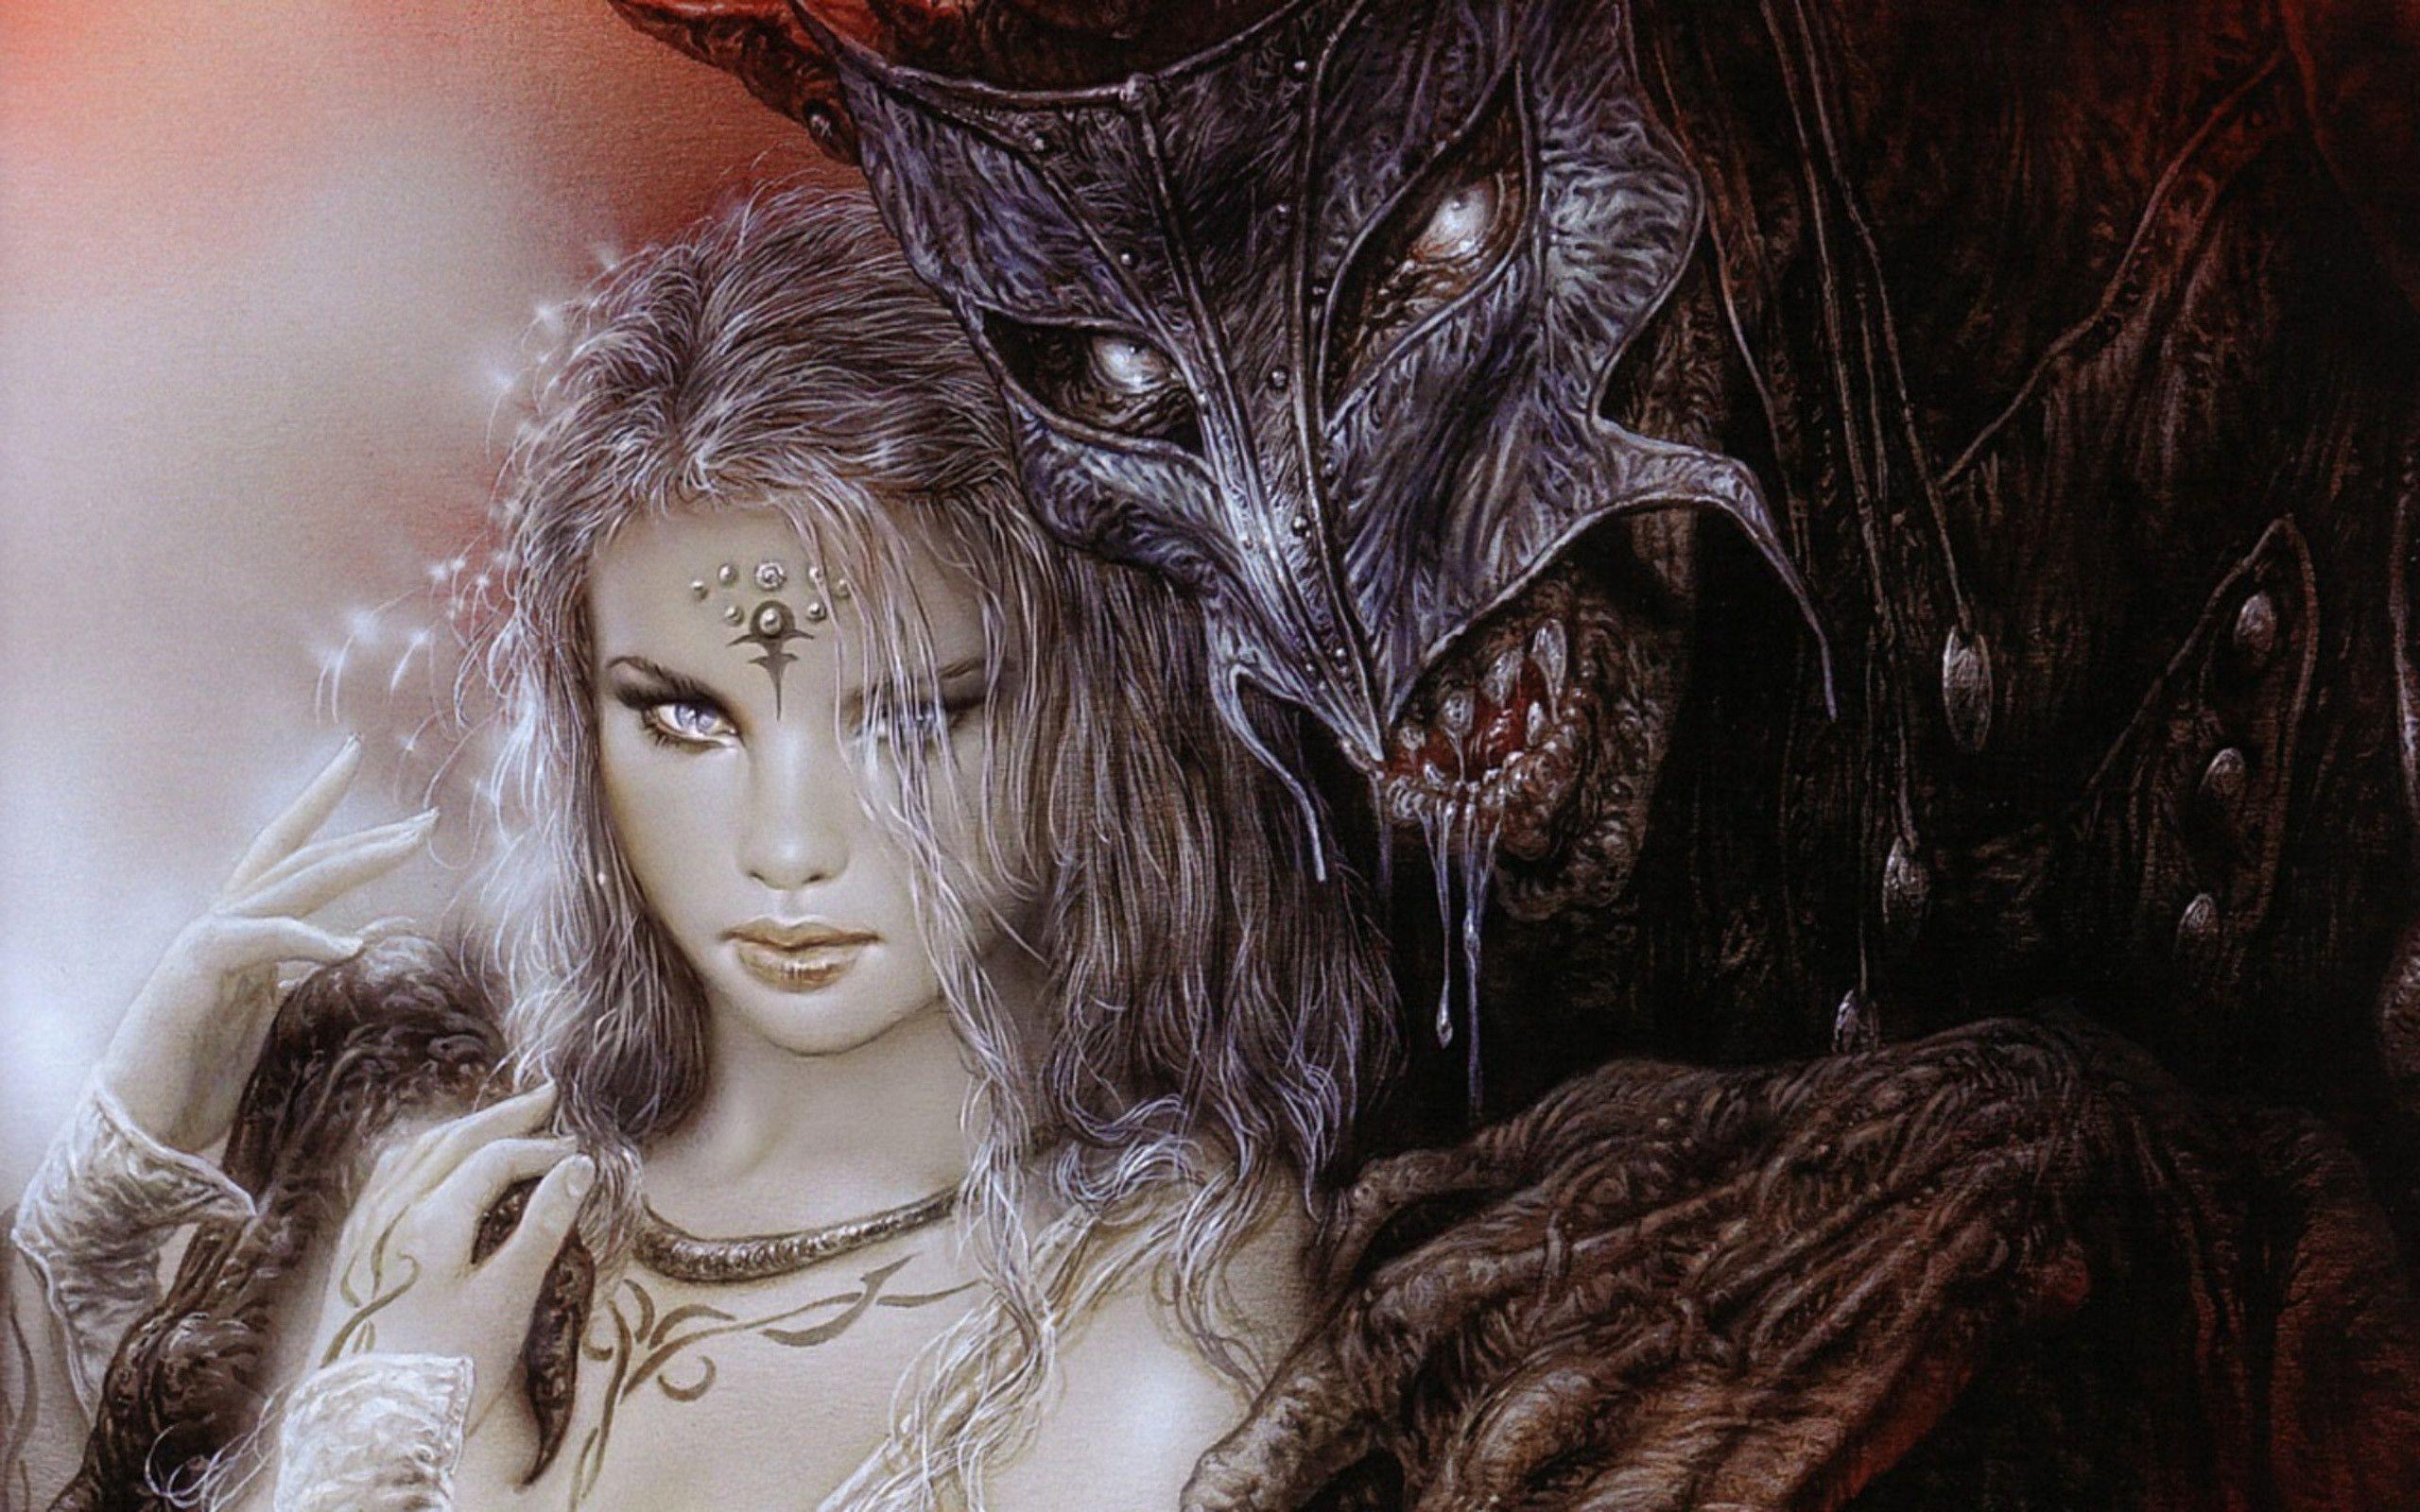 Lady and Demon - Luis Royo Wallpaper (36130603) - Fanpop